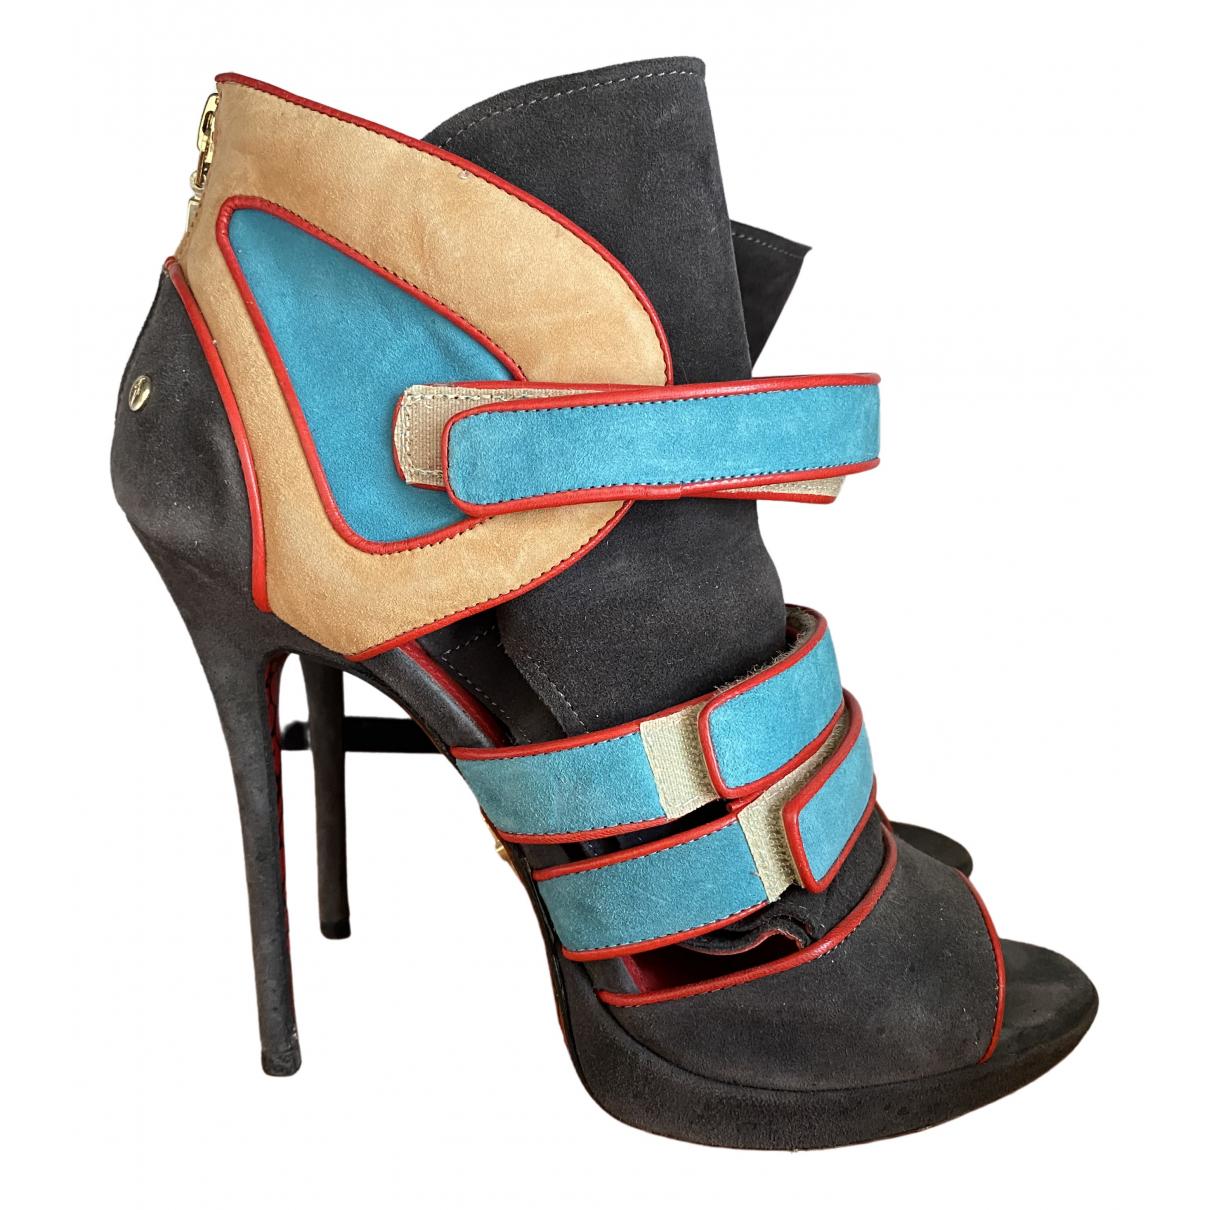 Cesare Paciotti \N Multicolour Suede Heels for Women 40 EU